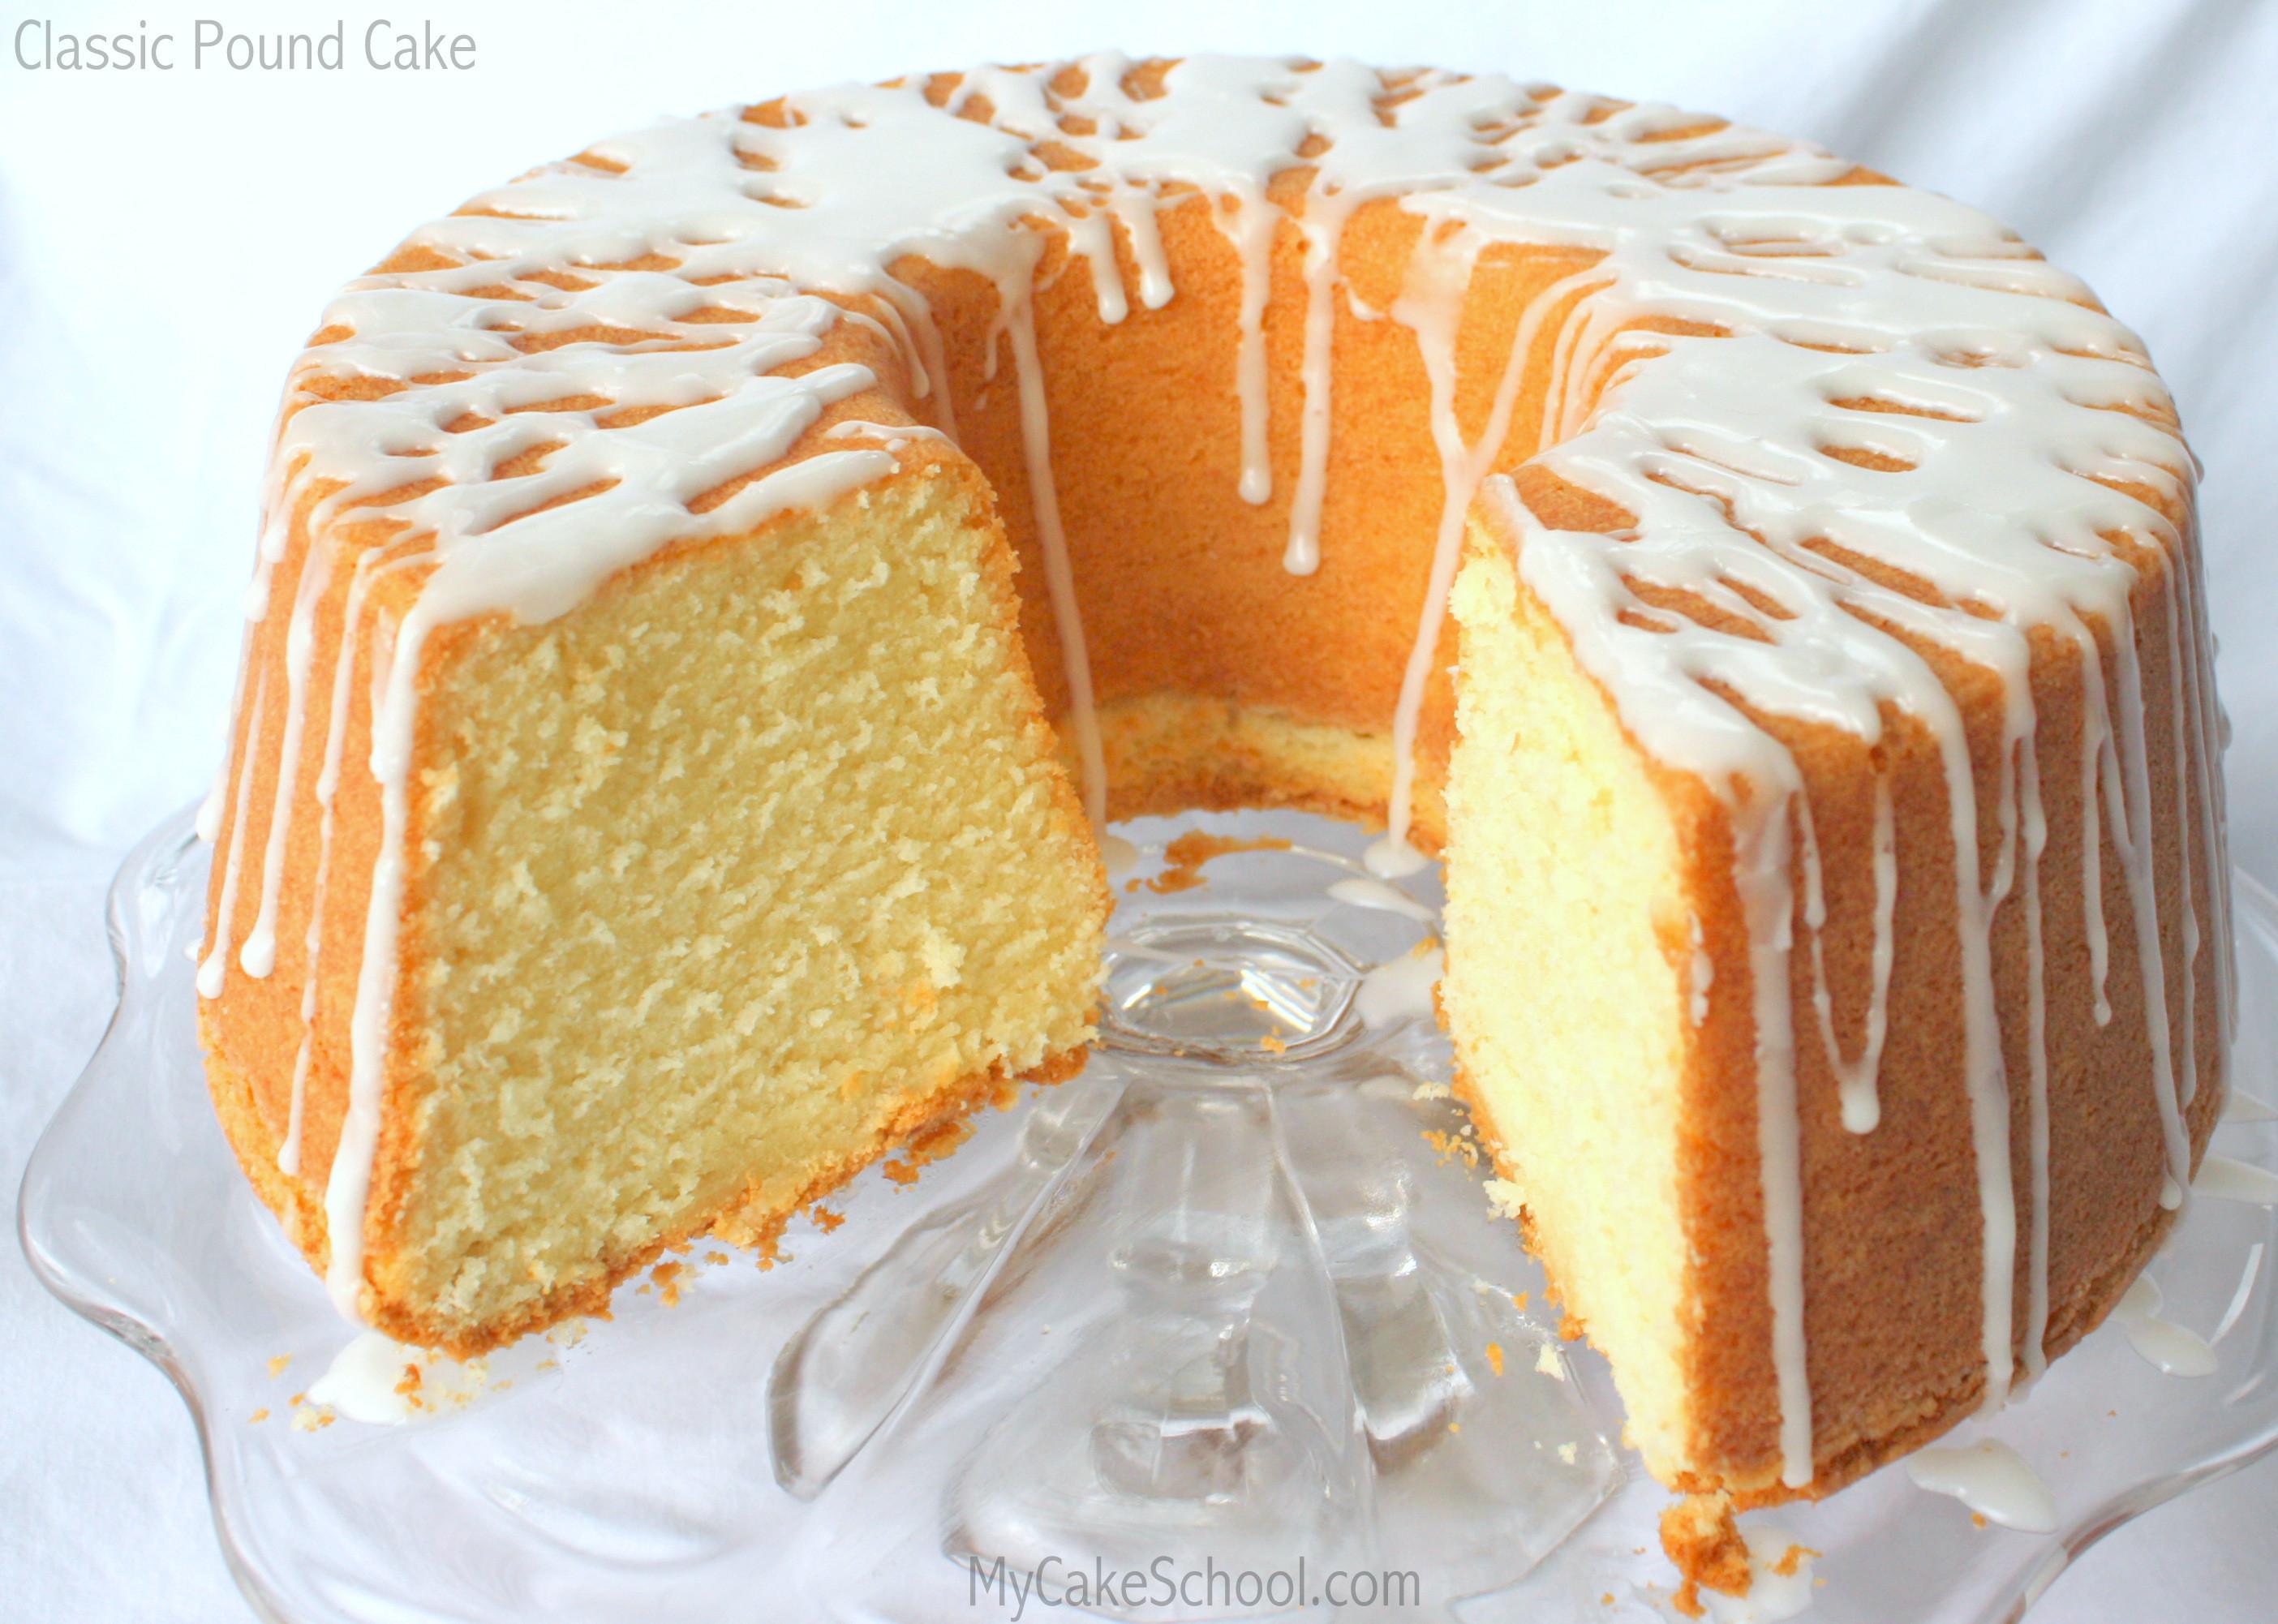 Classic Pound Cake Recipe  Classic Pound Cake Recipe by My Cake School